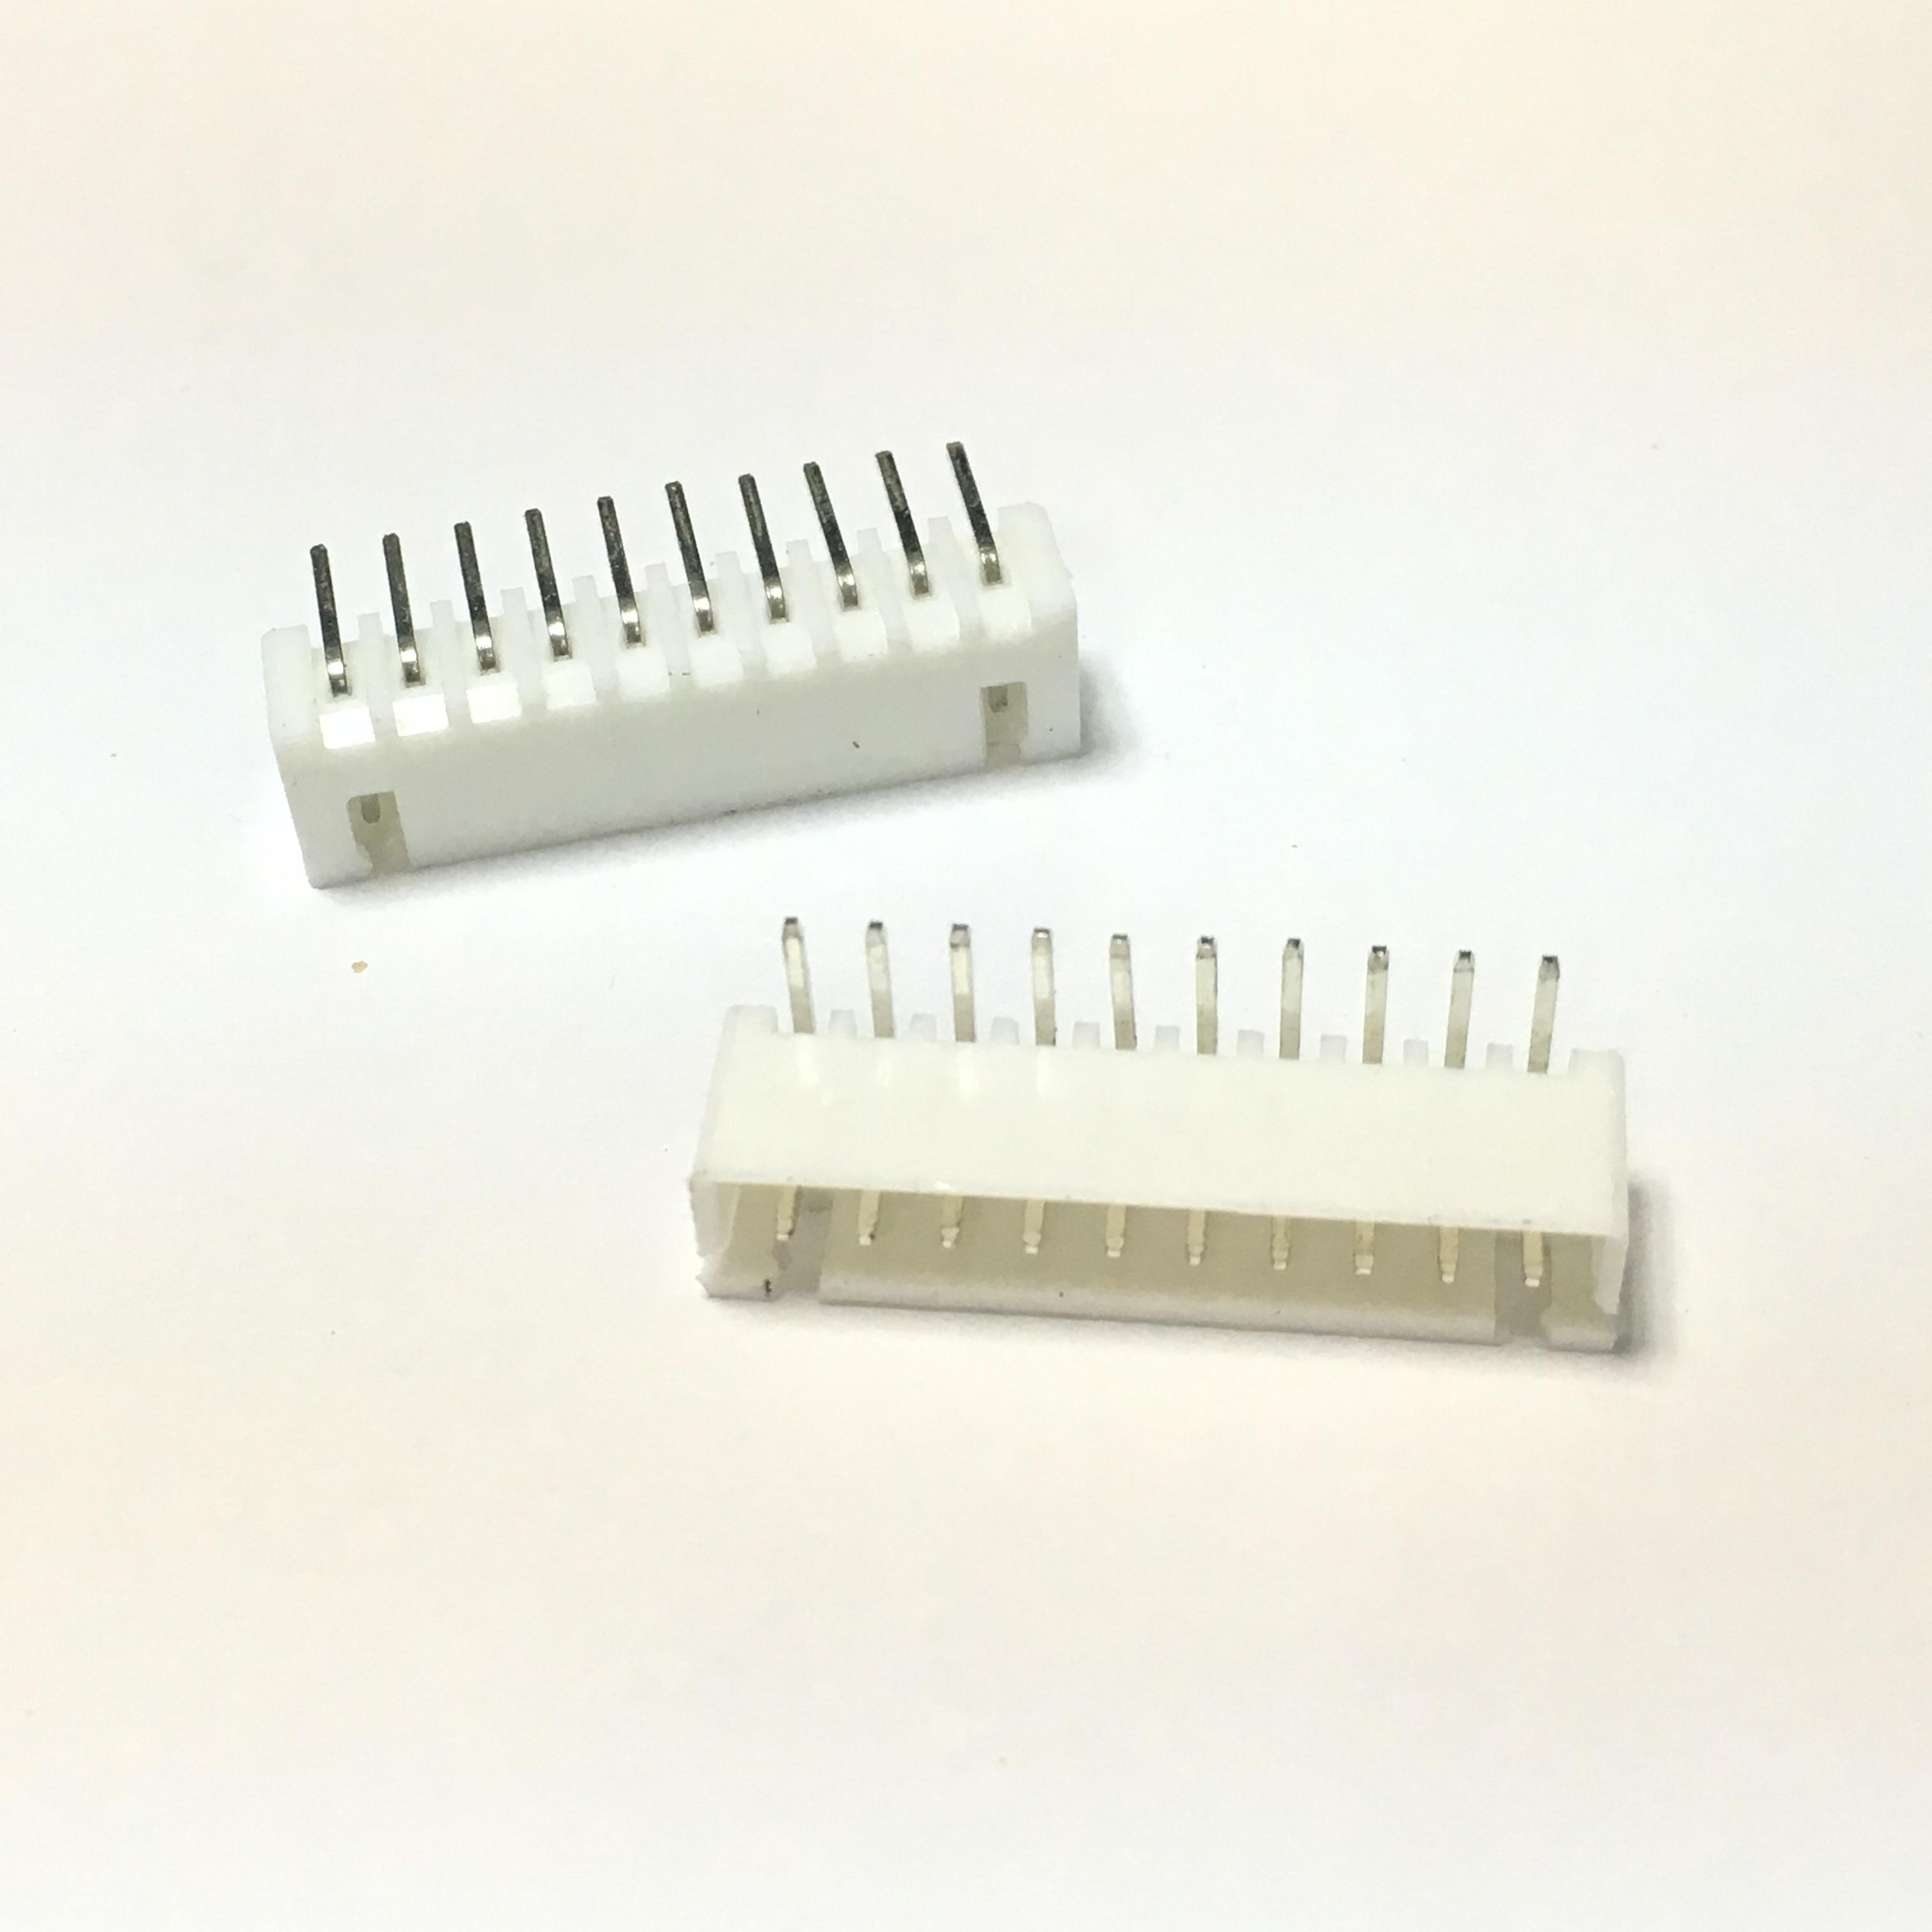 Купить с кэшбэком XH2.54 2/3/4/5/6/7/8/9/10/11/12/13/14/15/16 Pin 2.54mm Pitch Right Angle Male Pin Header Connector Pin Connectors Adaptor